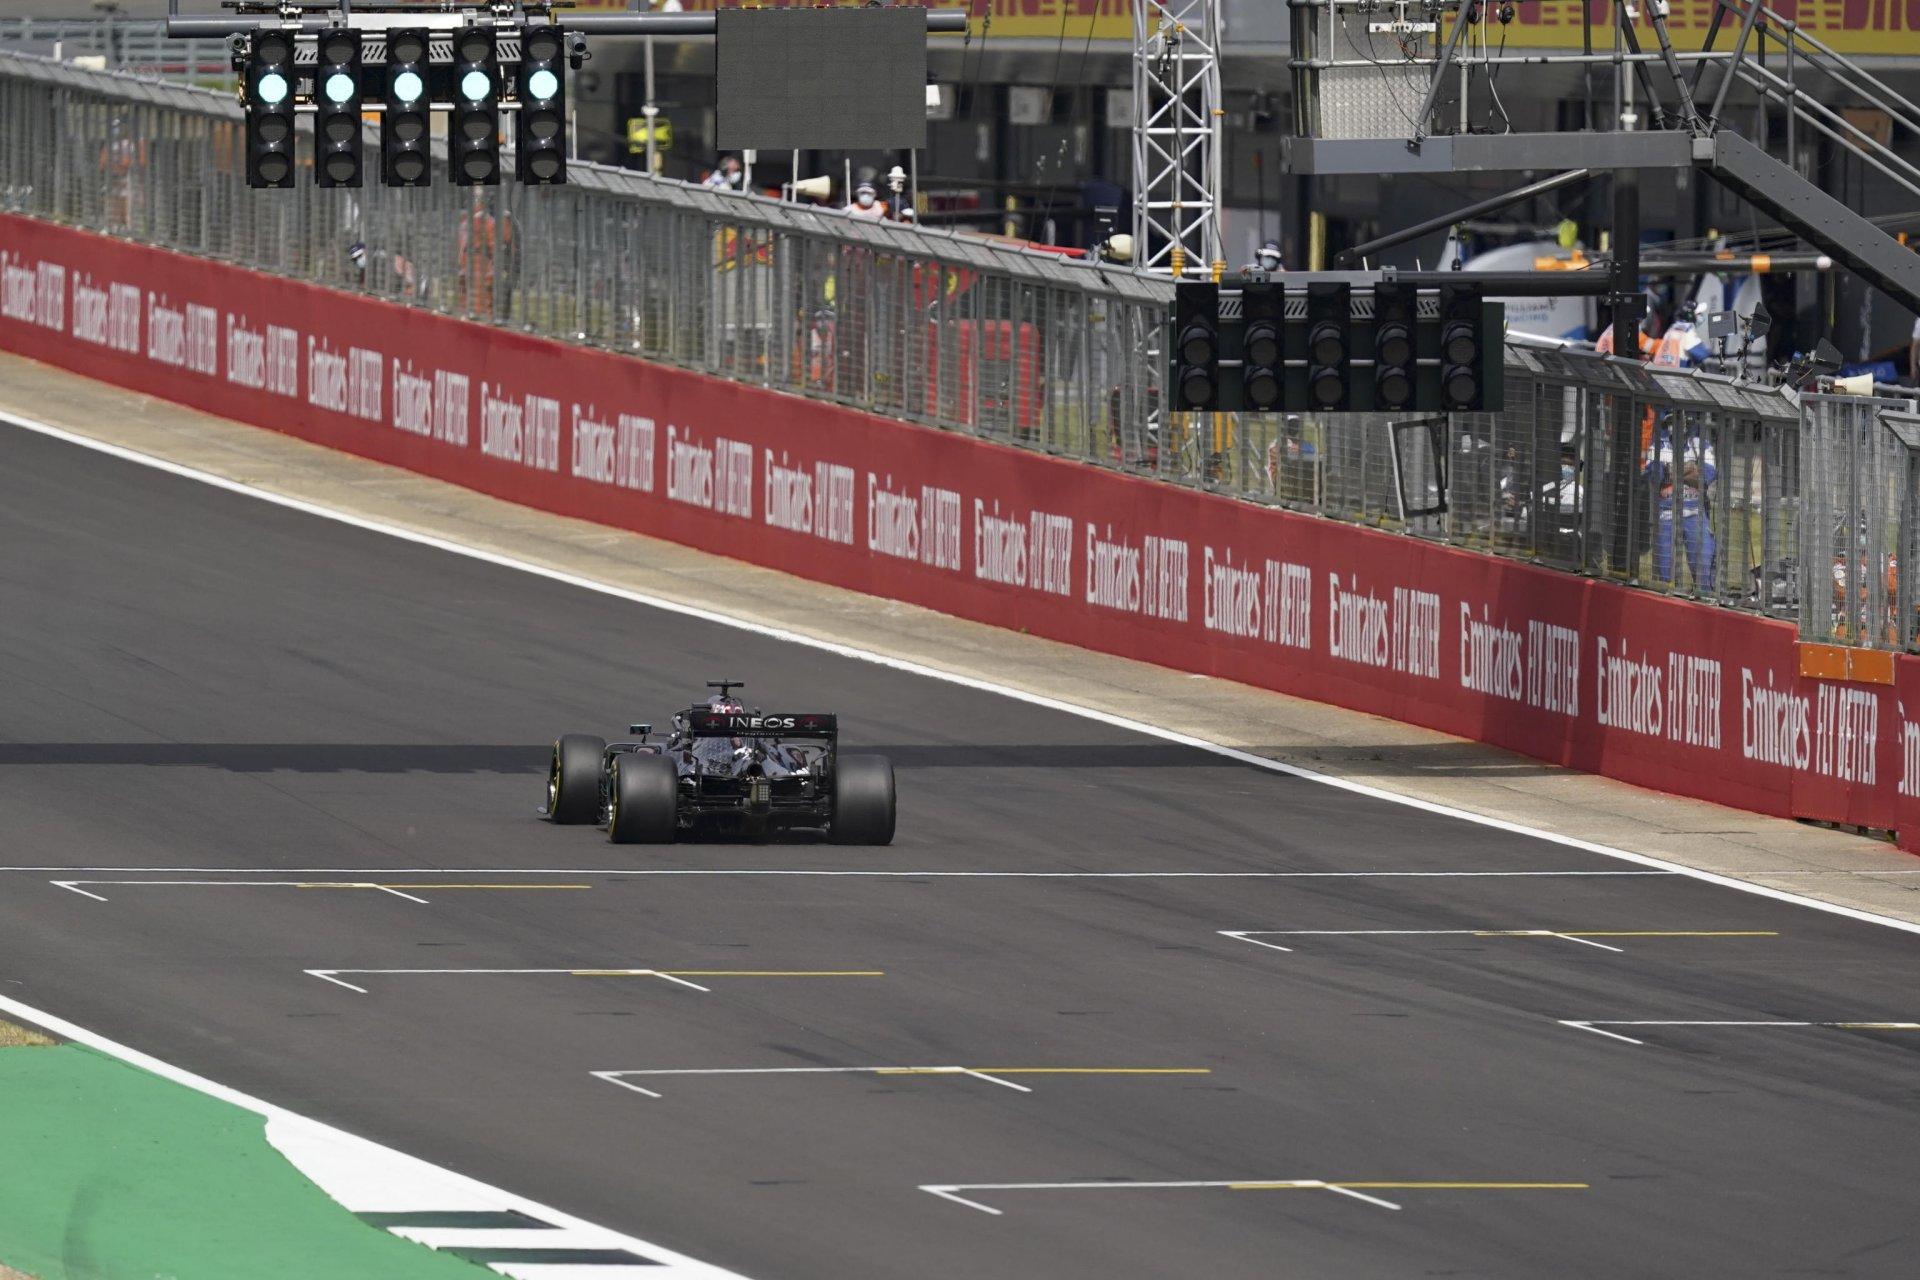 F1 70 Anniversario 2020, Gara - Diretta esclusiva Sky Sport, Differita TV8